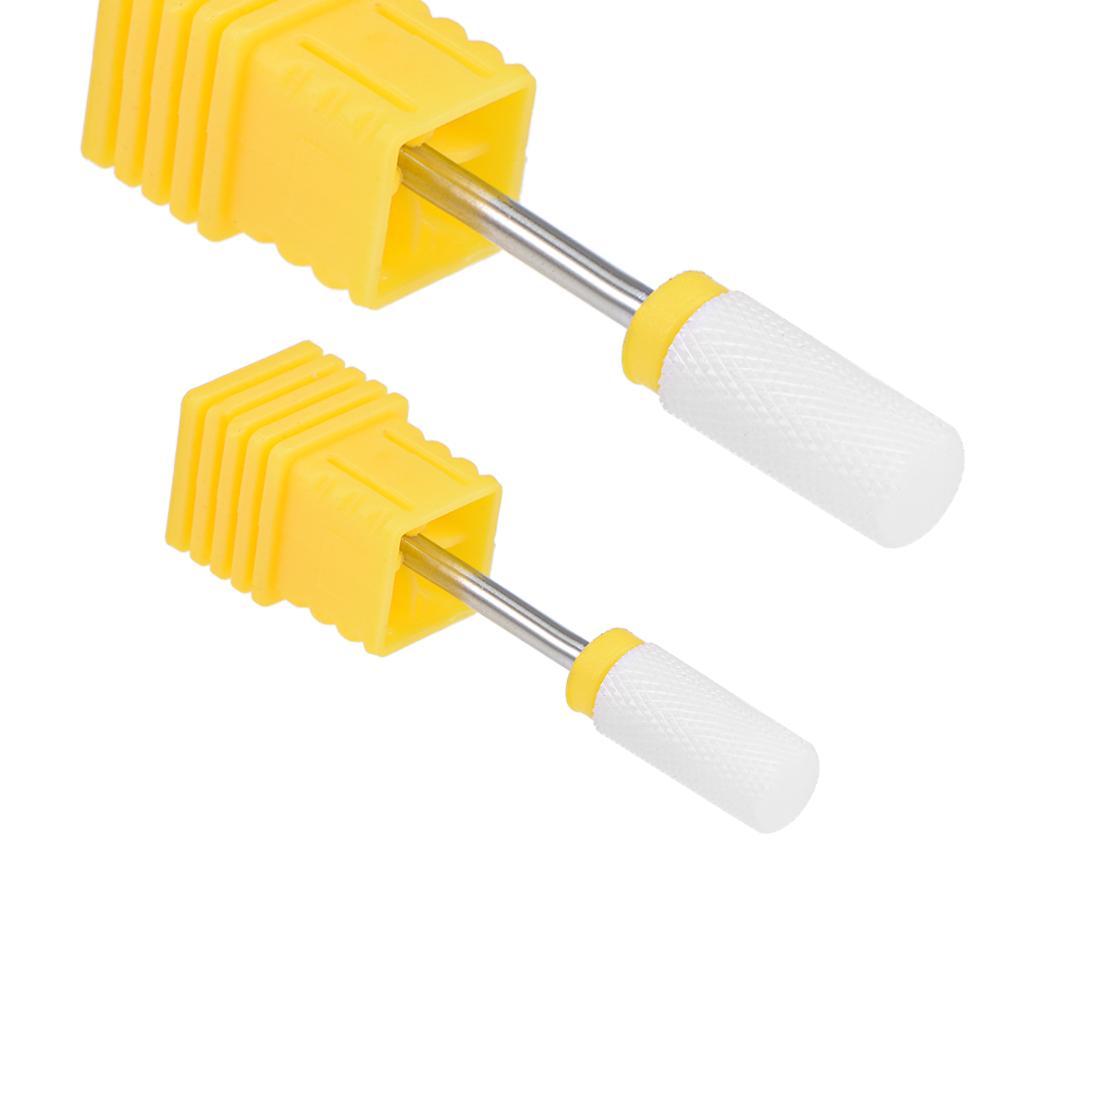 2pcs Ceramic Nail Drill Bits 3/32 inch (Extra Fine Grit) Electric Nails File Bit